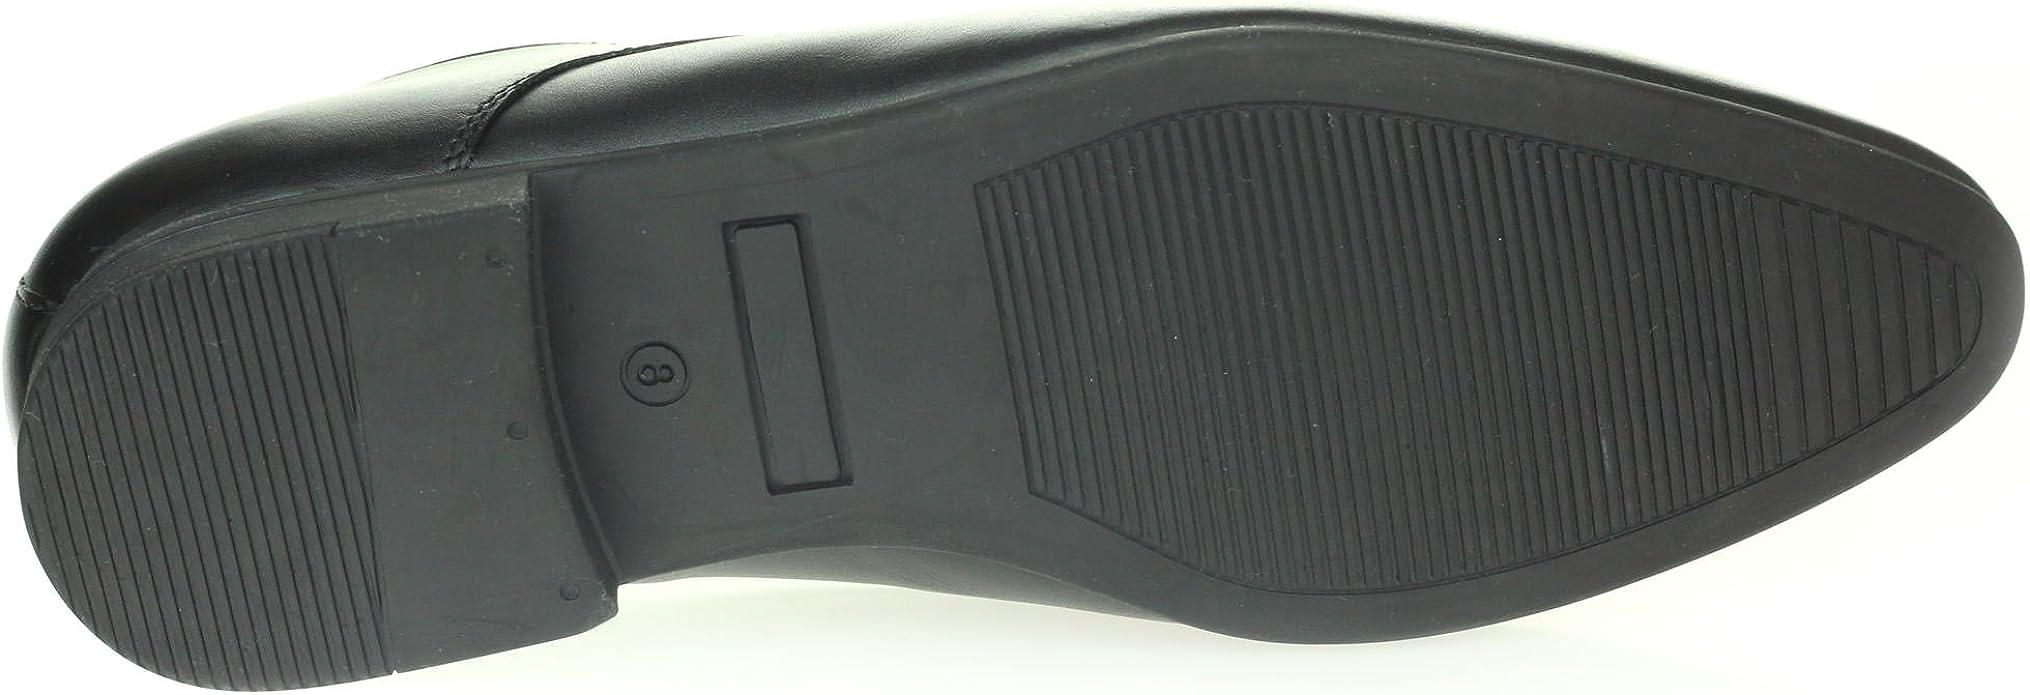 AARZ LONDON Hommes Gents Intelligent Talon cubain Soir Mariage F/ête Bureau Travail Formel Cuir Enfiler Chaussures Taille